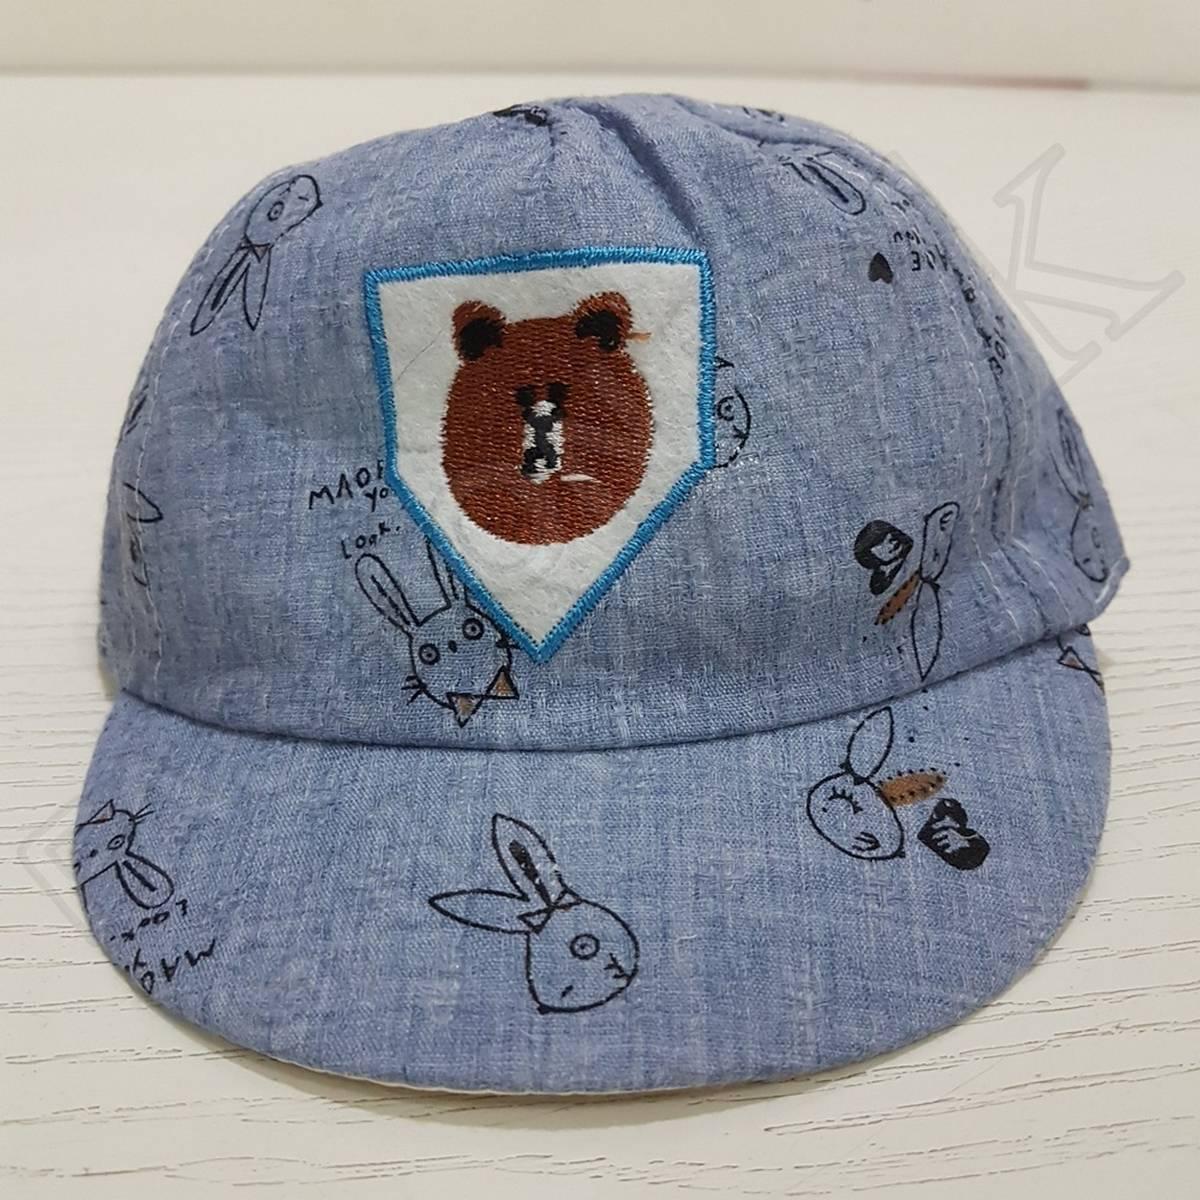 Stylish Baby Cap In Hat shape In For Summer Season